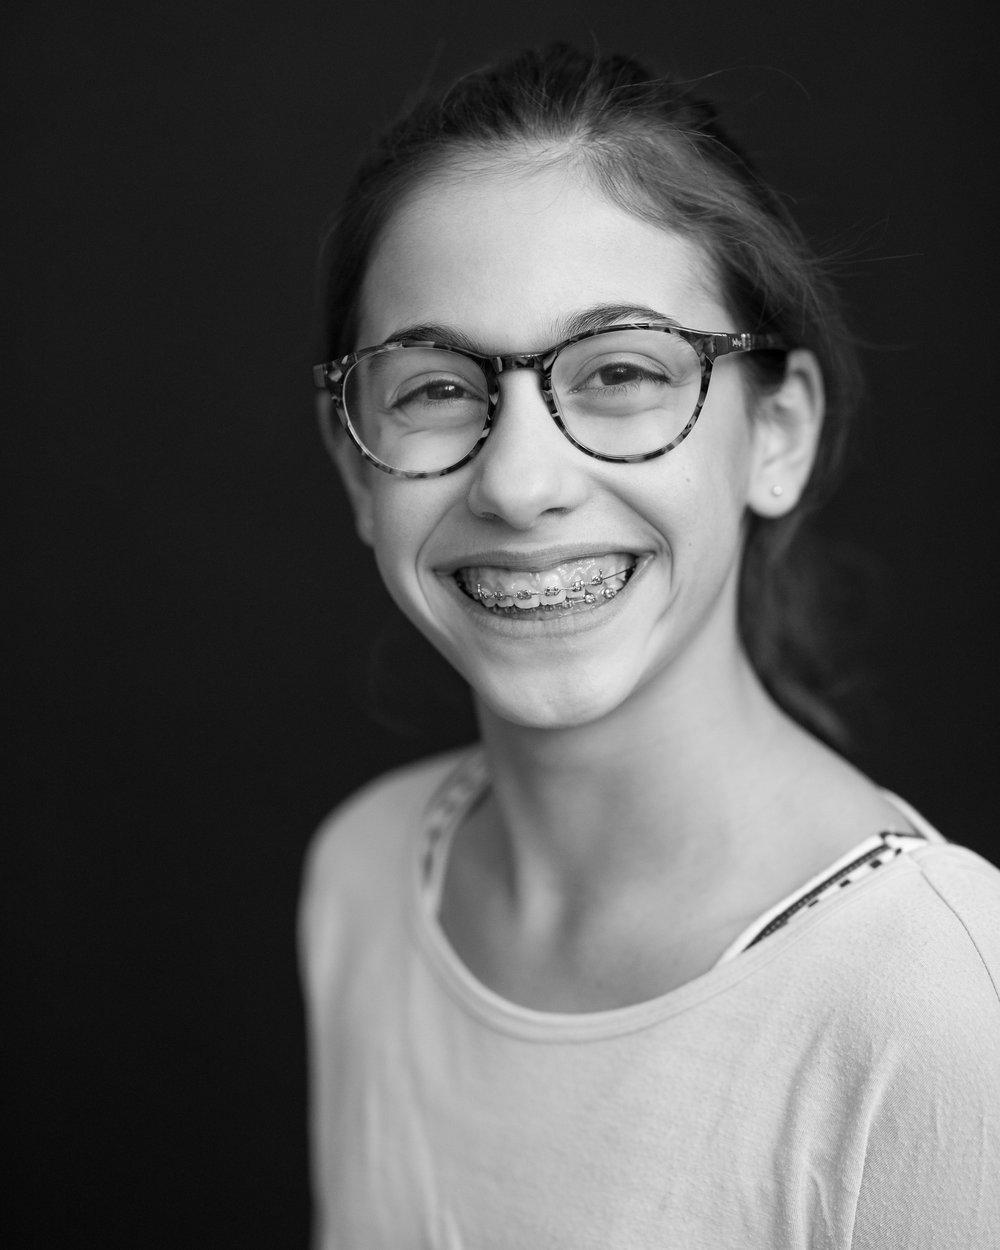 Julia Findikyan